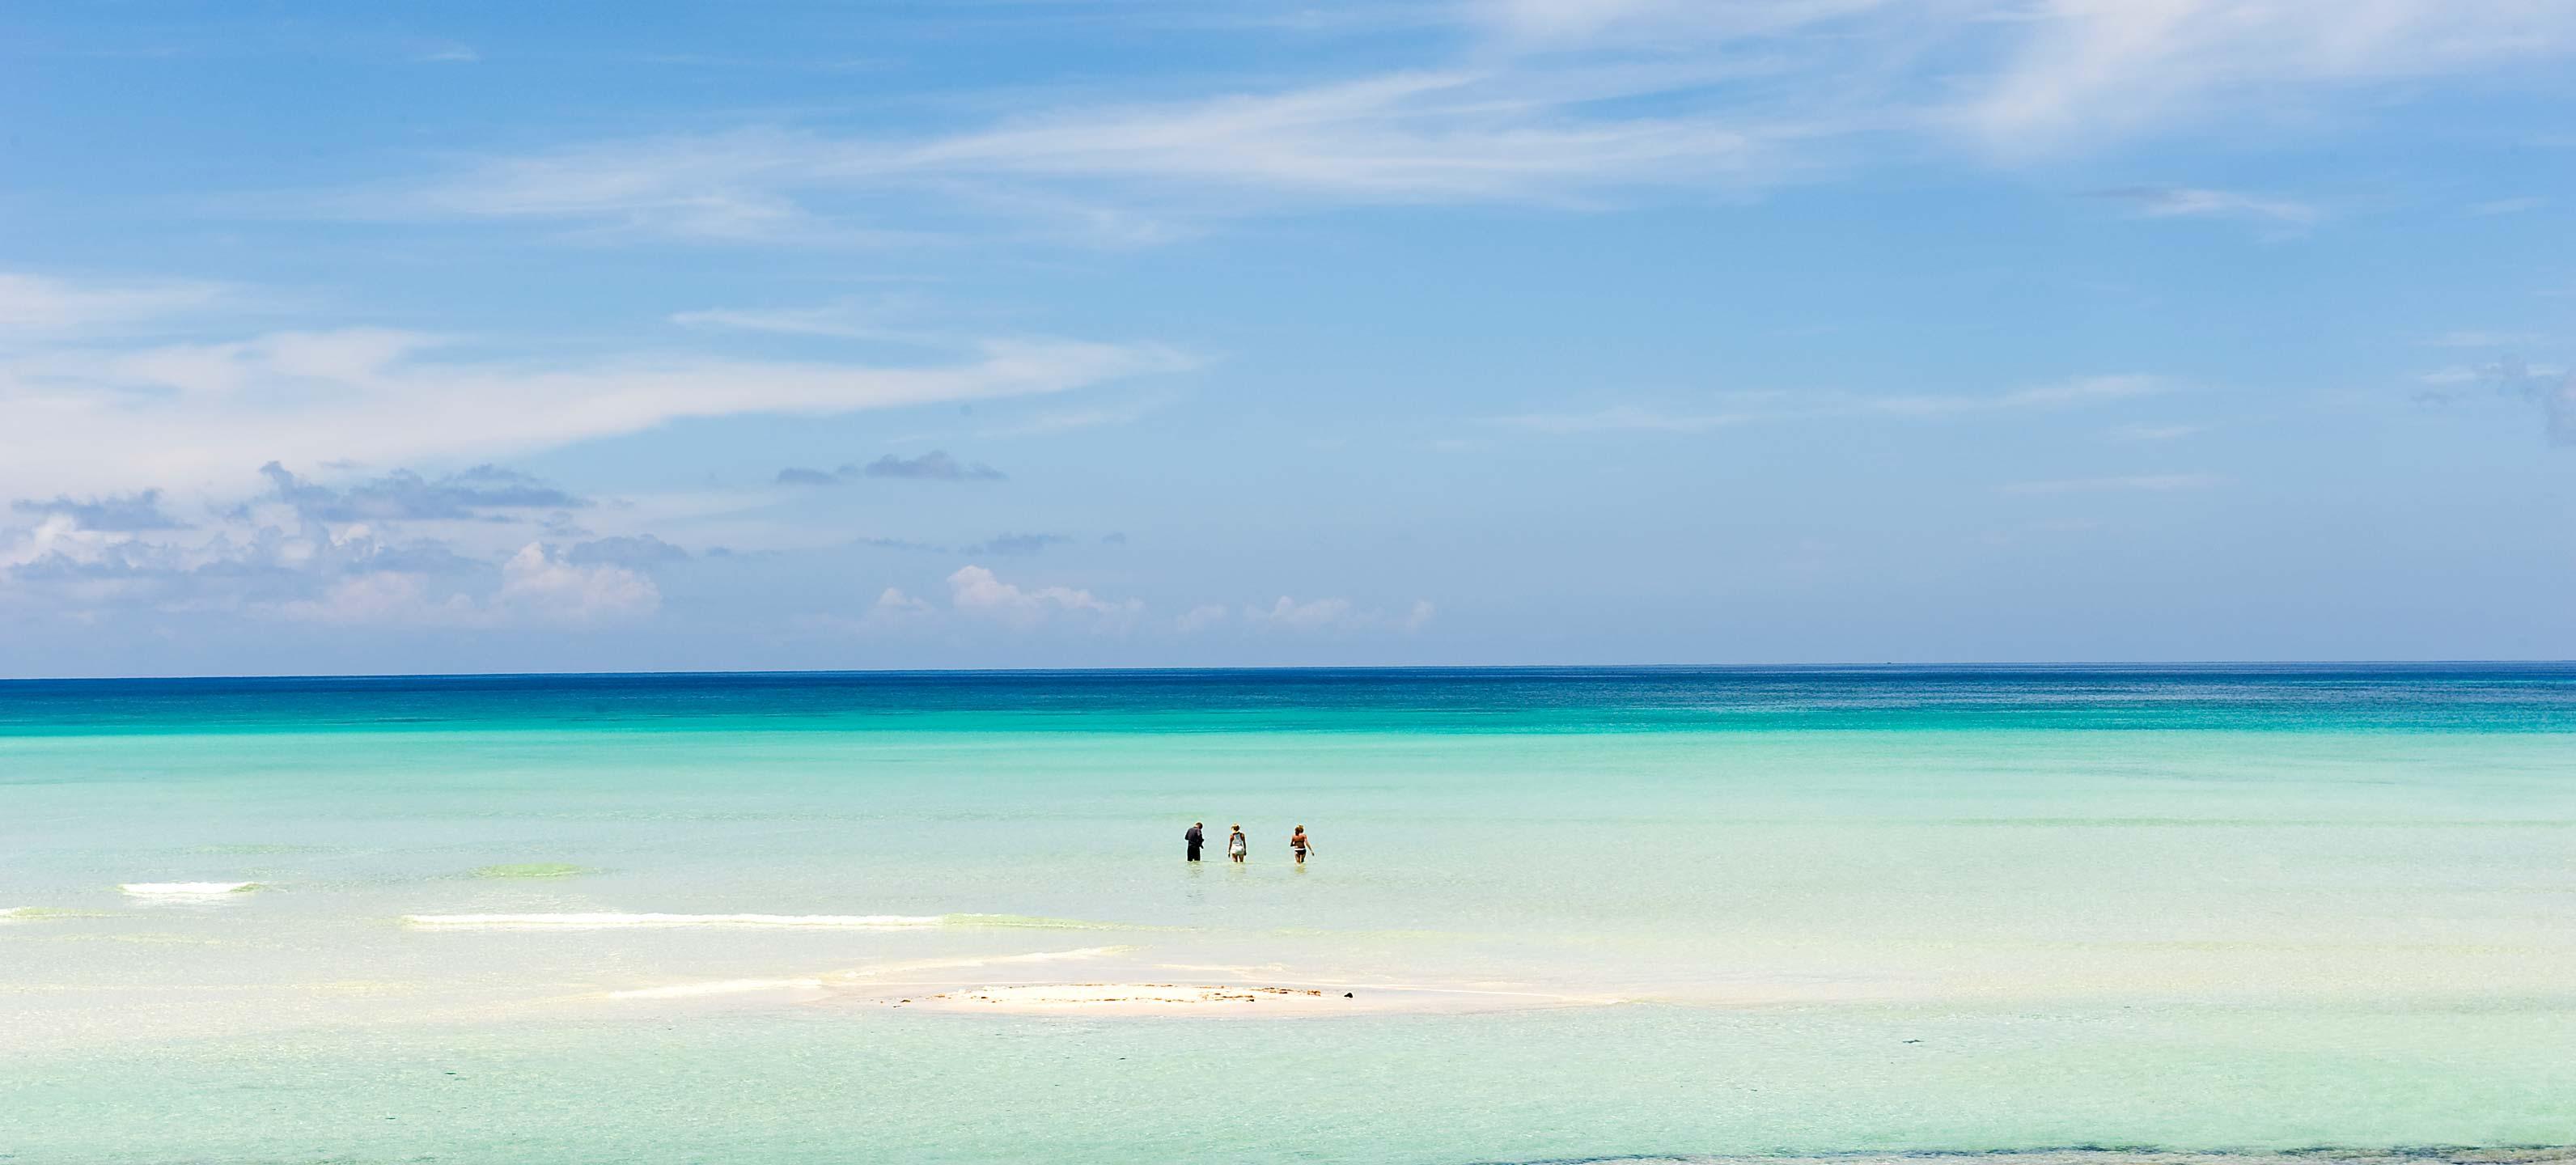 Strand und Badeurlaub in Vamizi Insel Mosambik Strandspaziergang Indischer Ozean